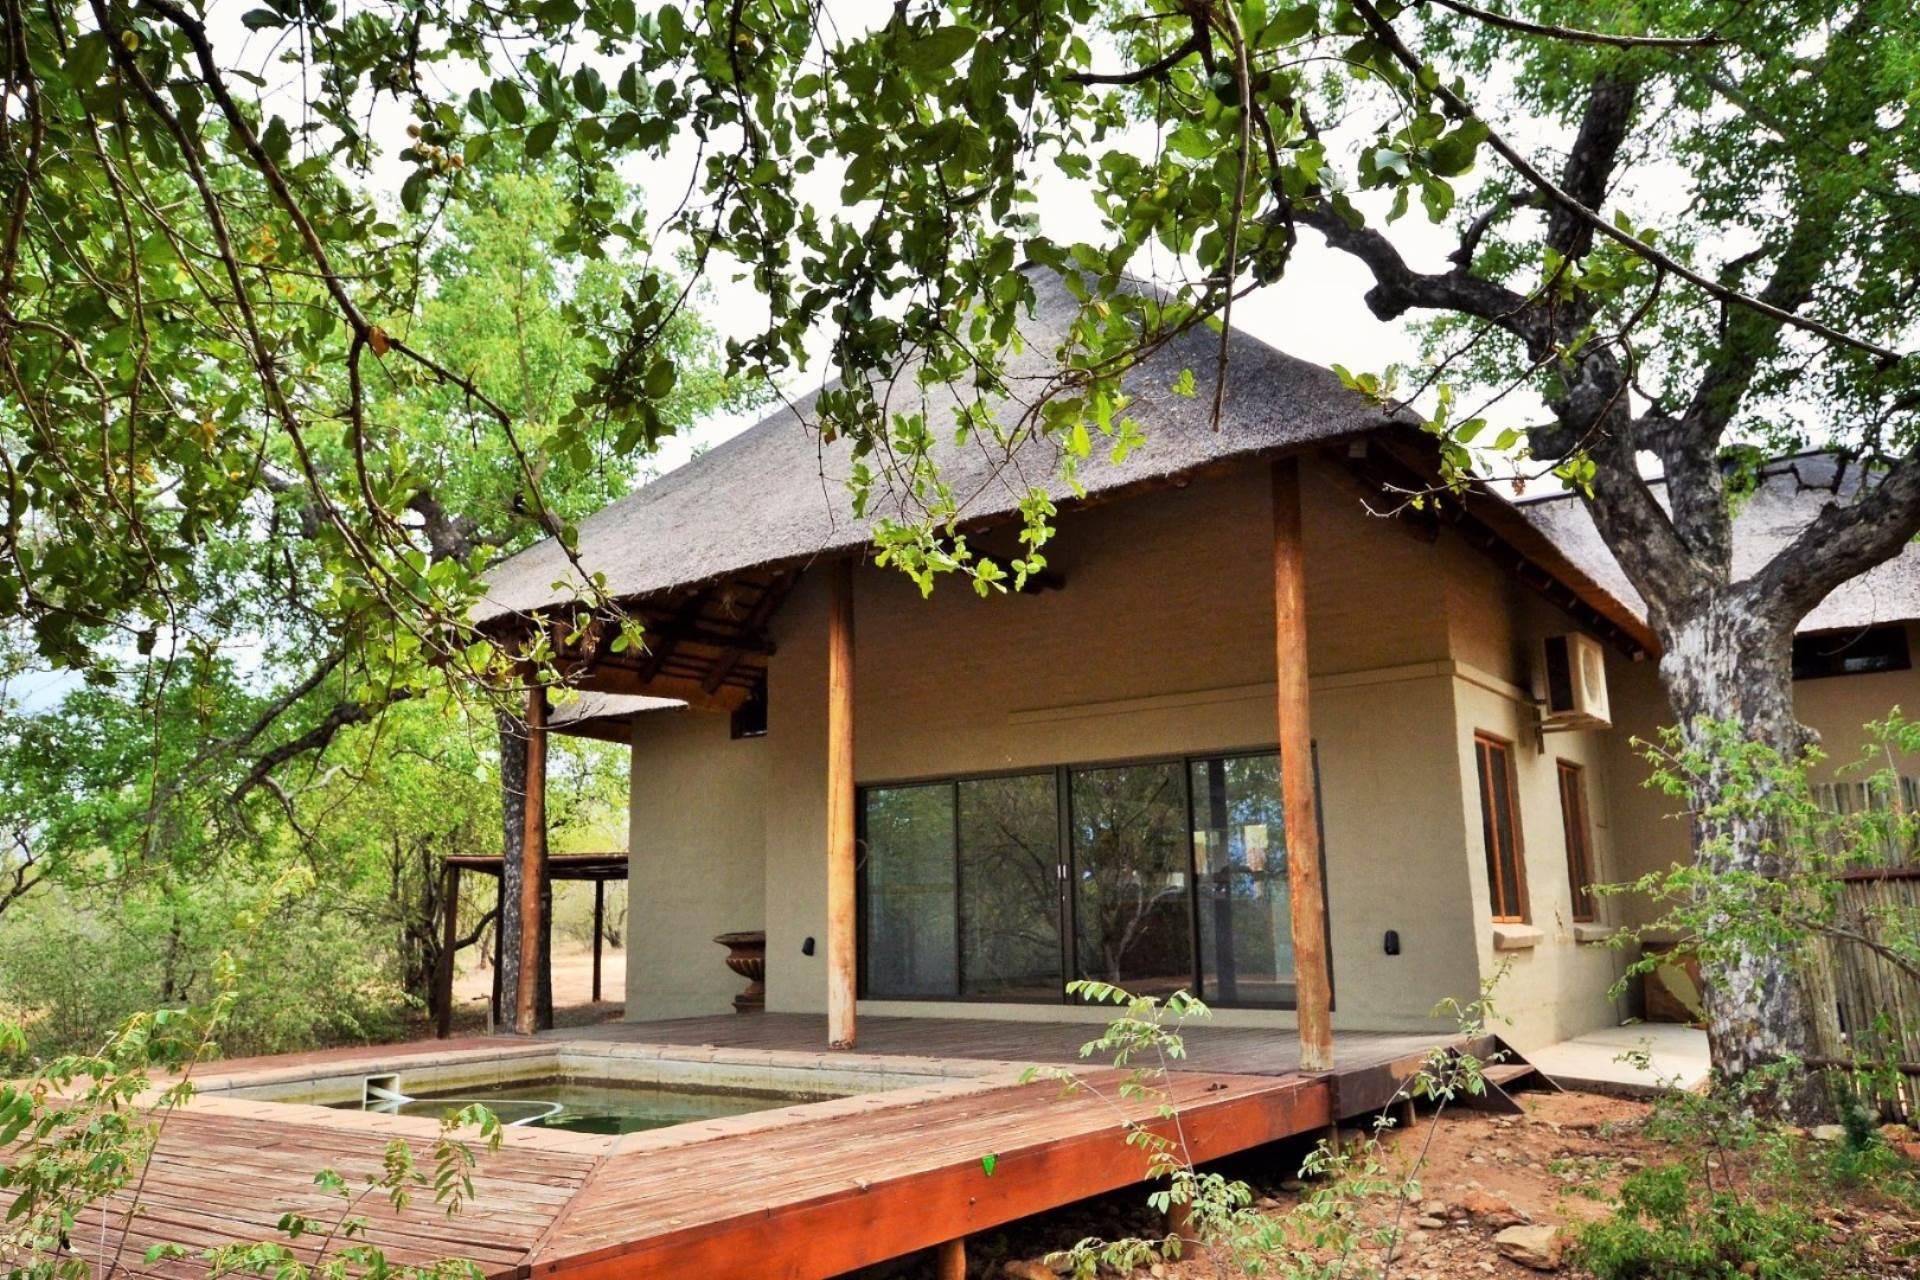 2 BedroomHouse For Sale In Raptors View